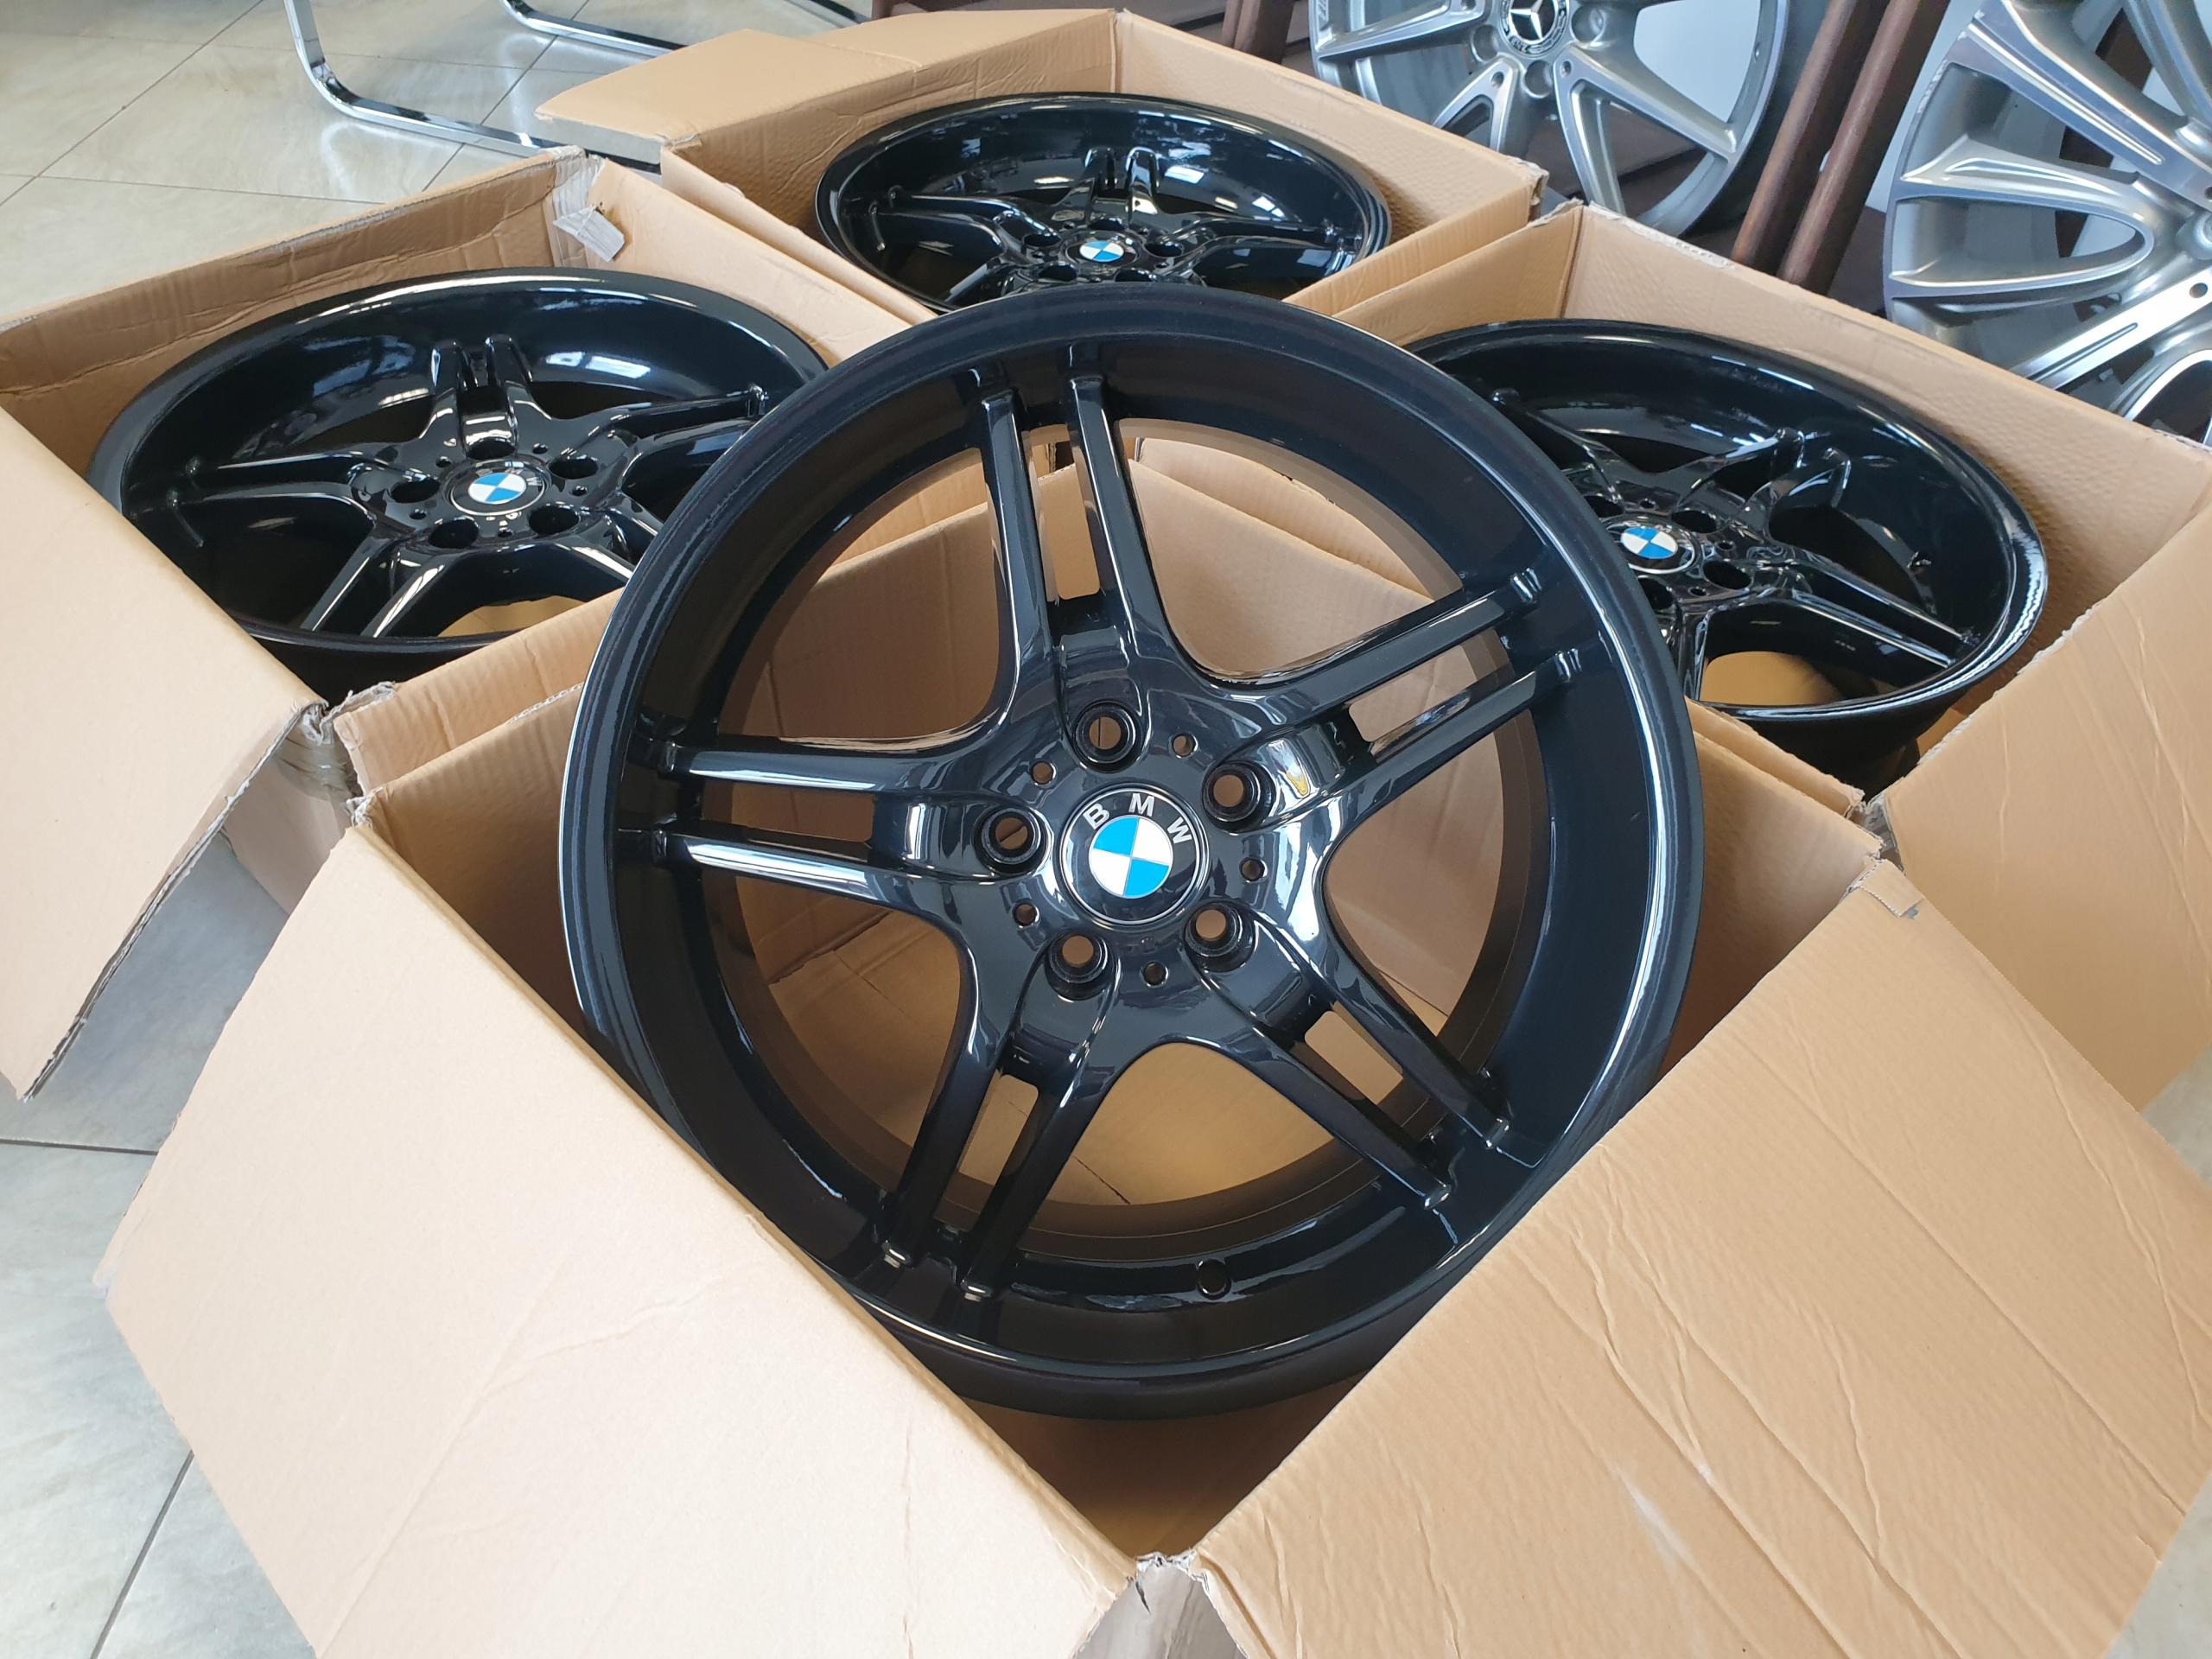 CZARNE Alufelgi felgi BMW Serii 5 E60 E61 19 CALI